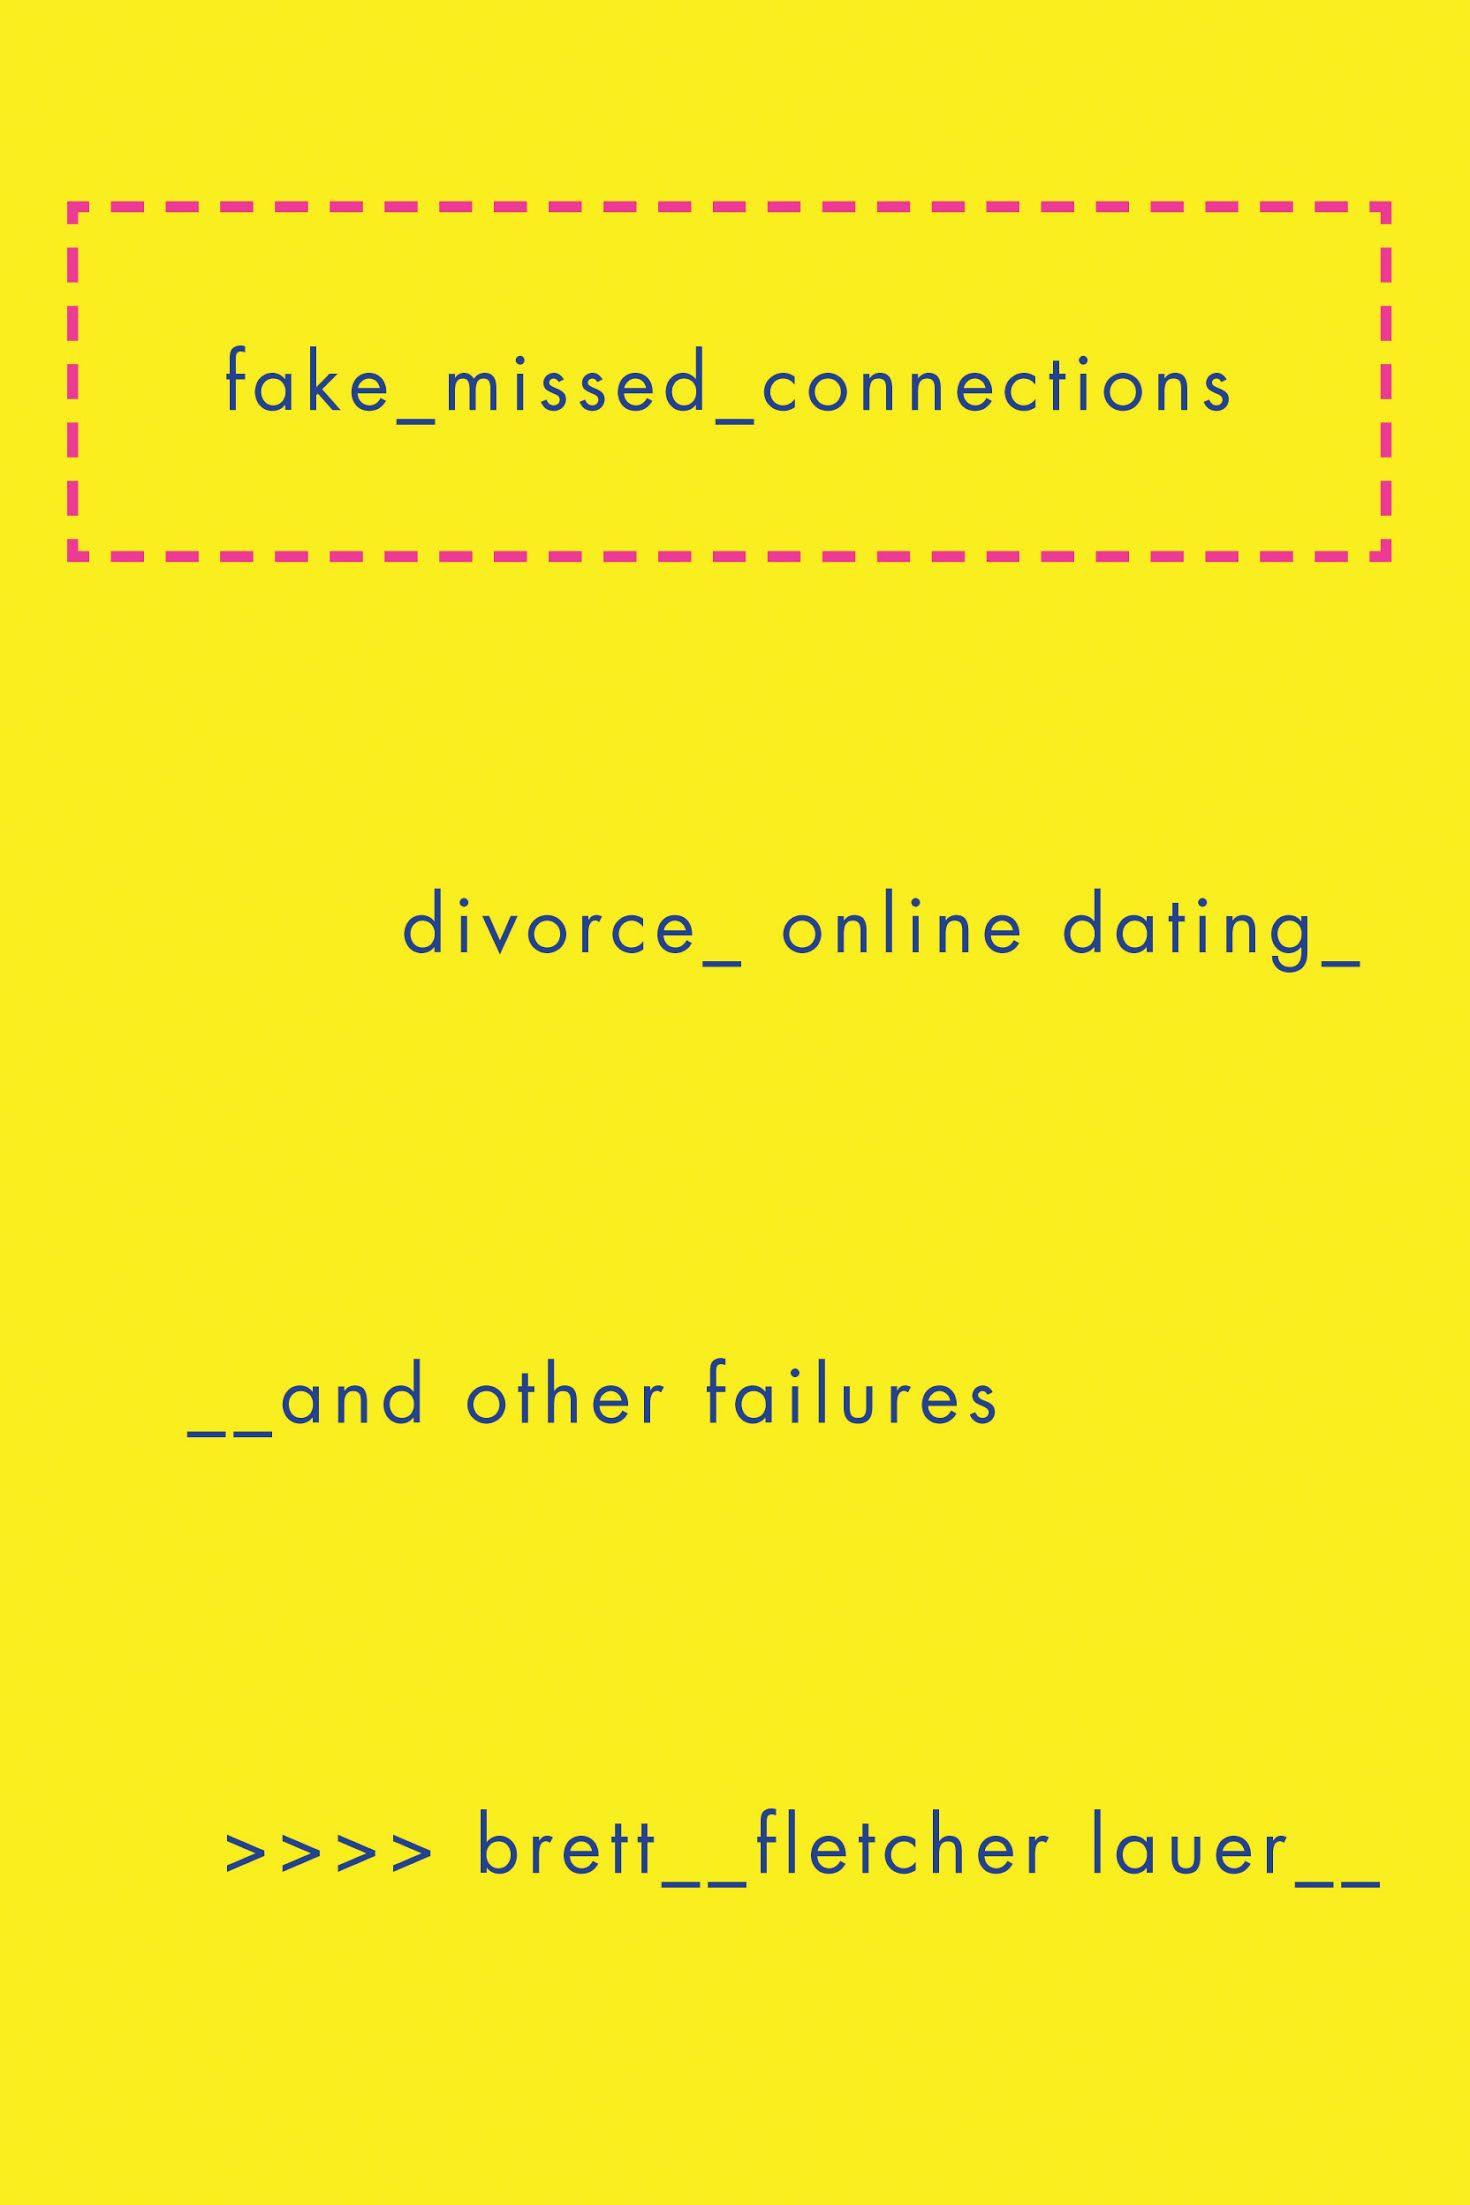 online-dating-leads-to-divorce-poor-girl-nude